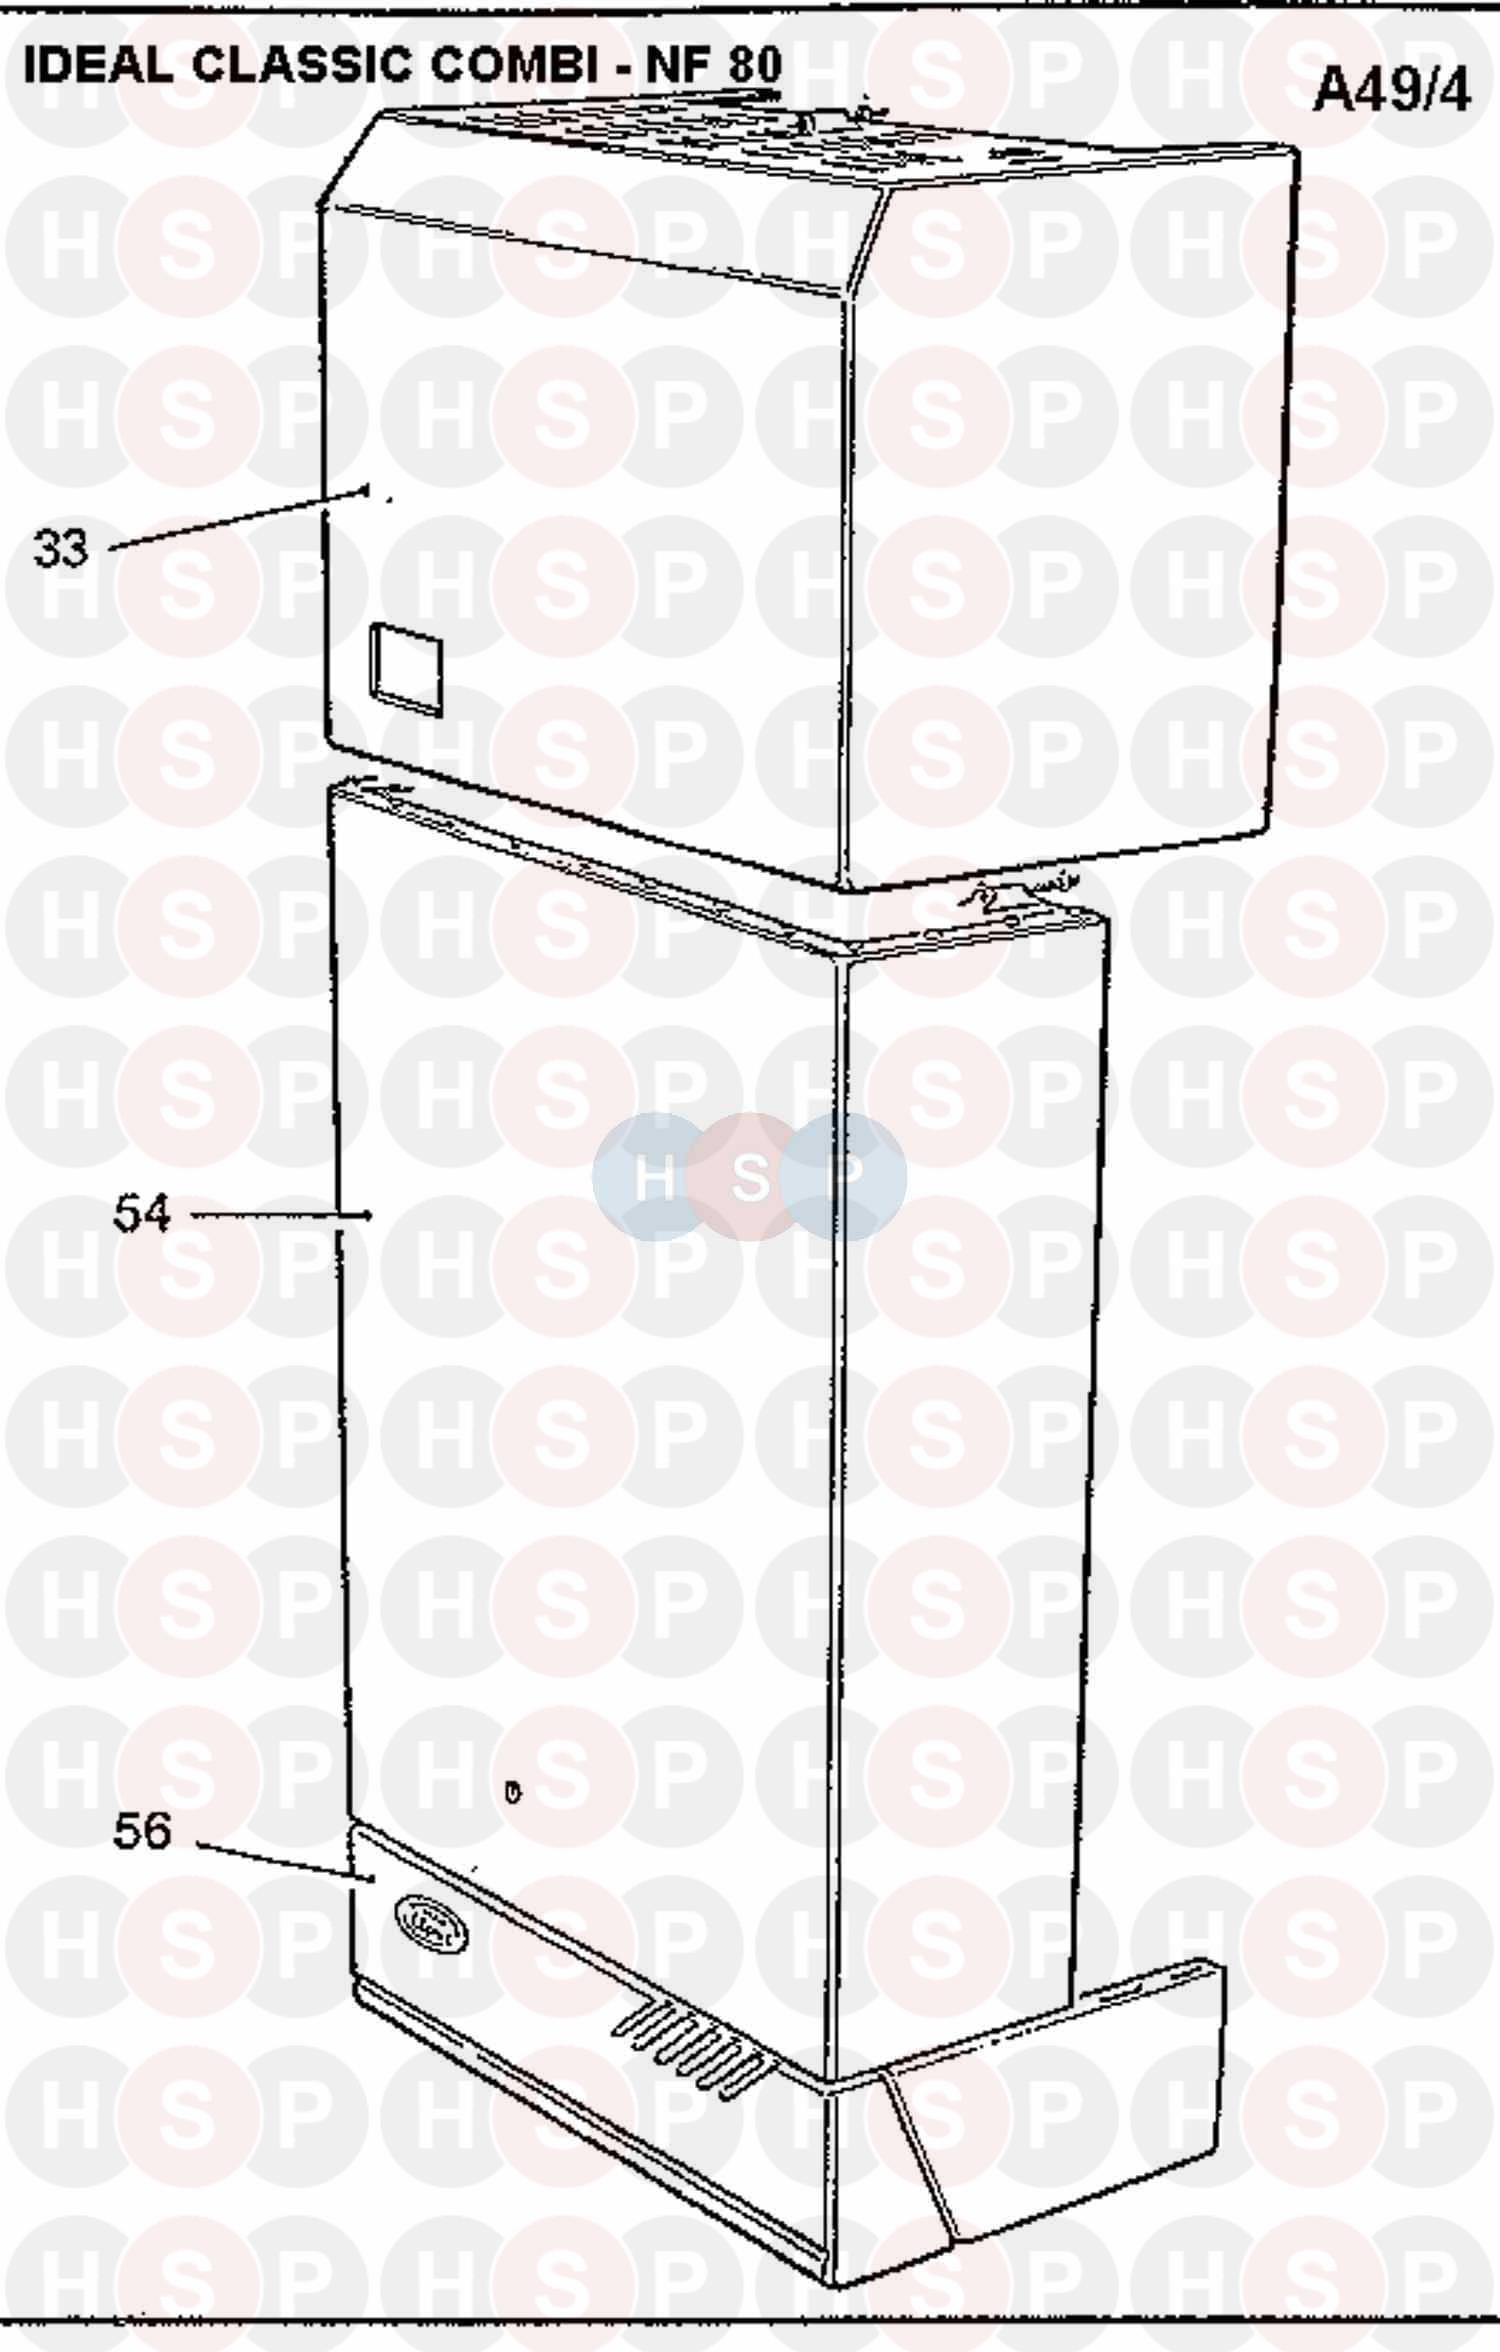 Ideal Classic Combi Nf80  Boiler Casing Diagram